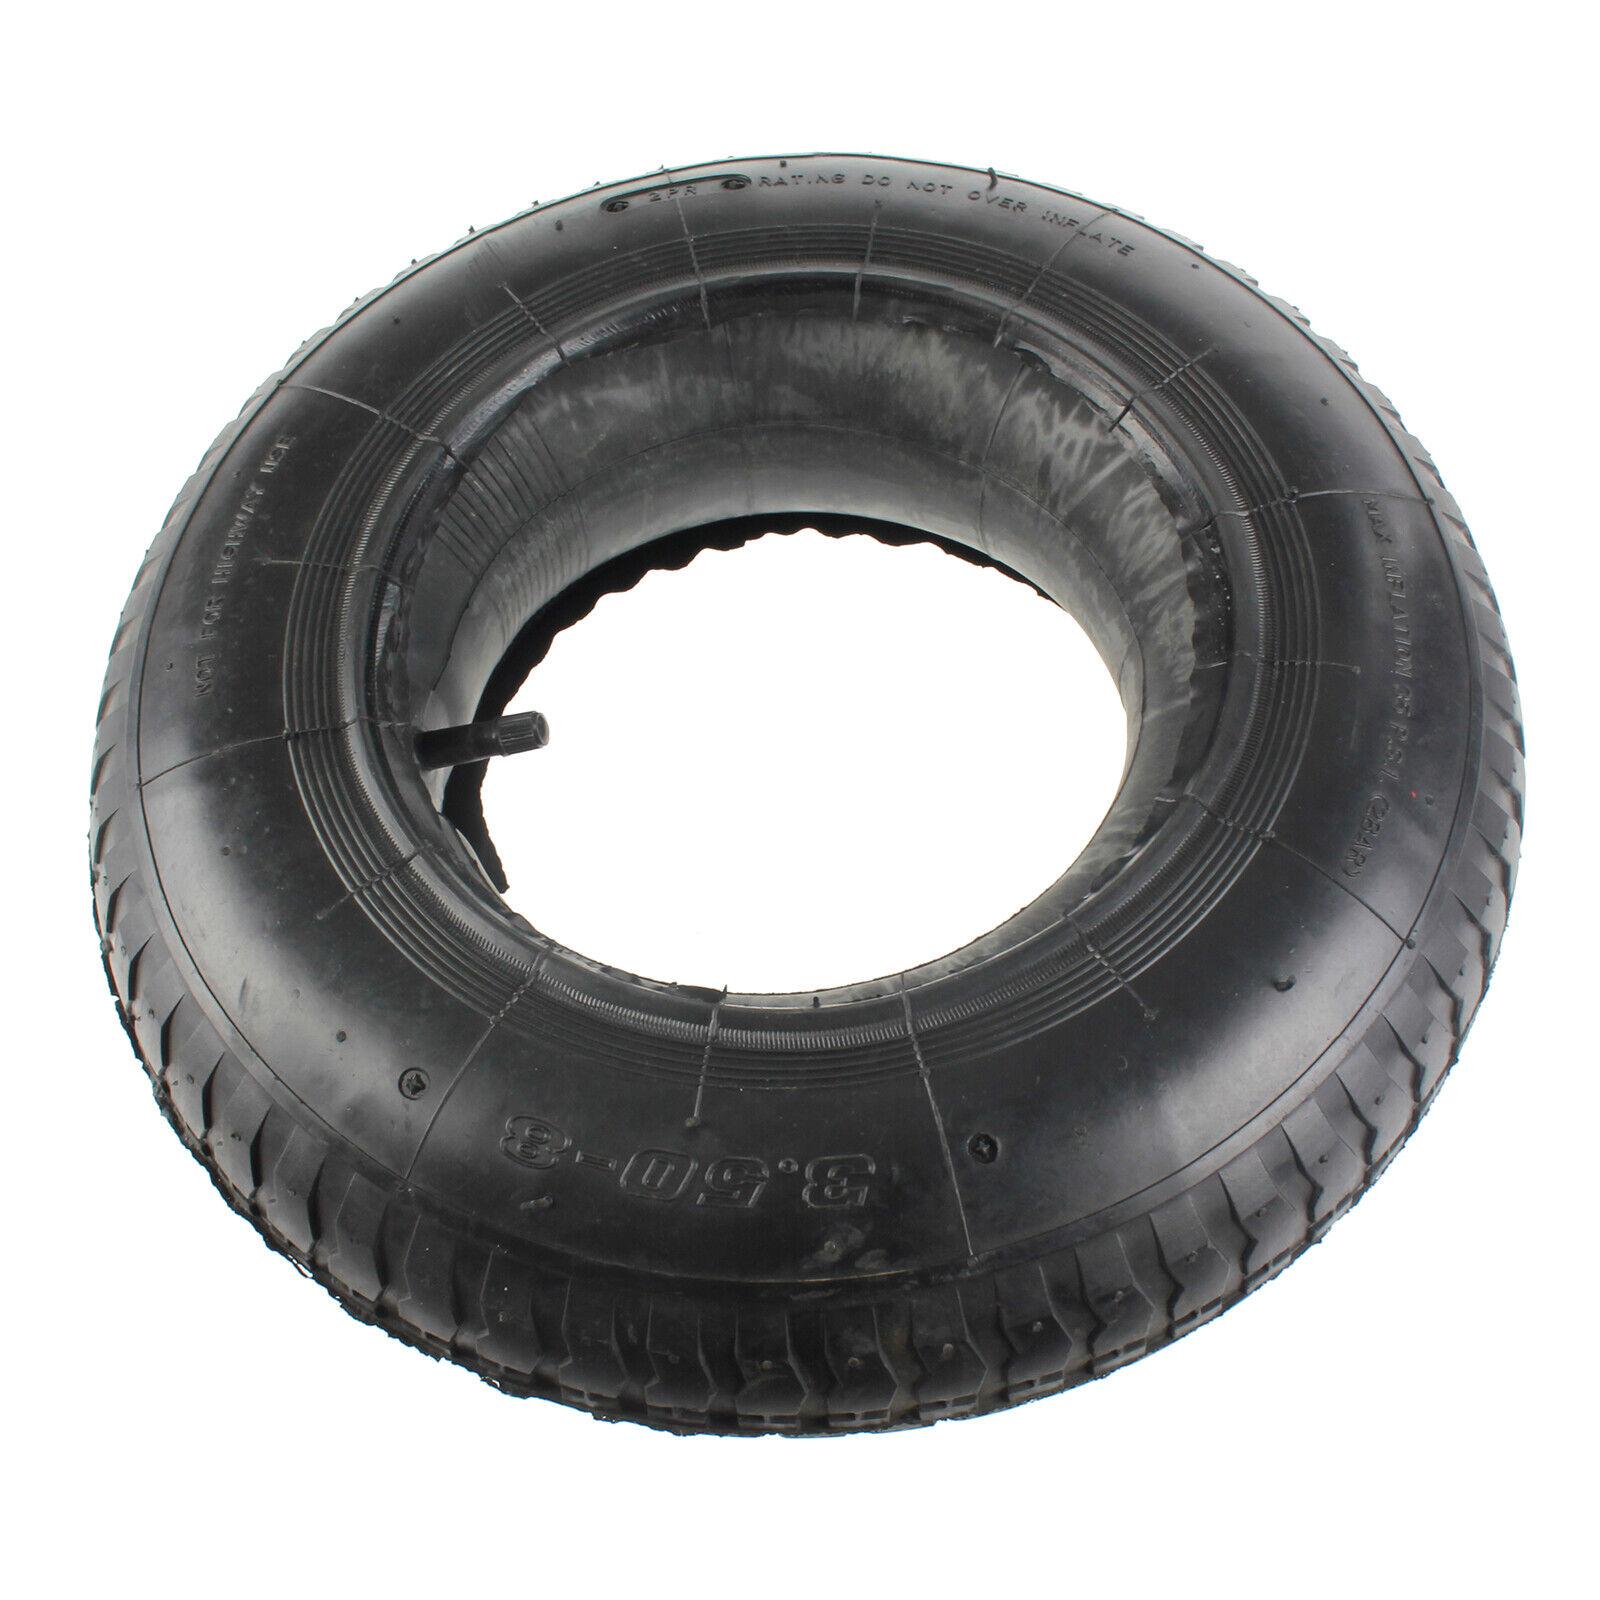 "NEW 2 X WHEELBARROW WHEEL INNER TUBE AND BARROW TYRE RUBBER INNERTUBE 8/"""